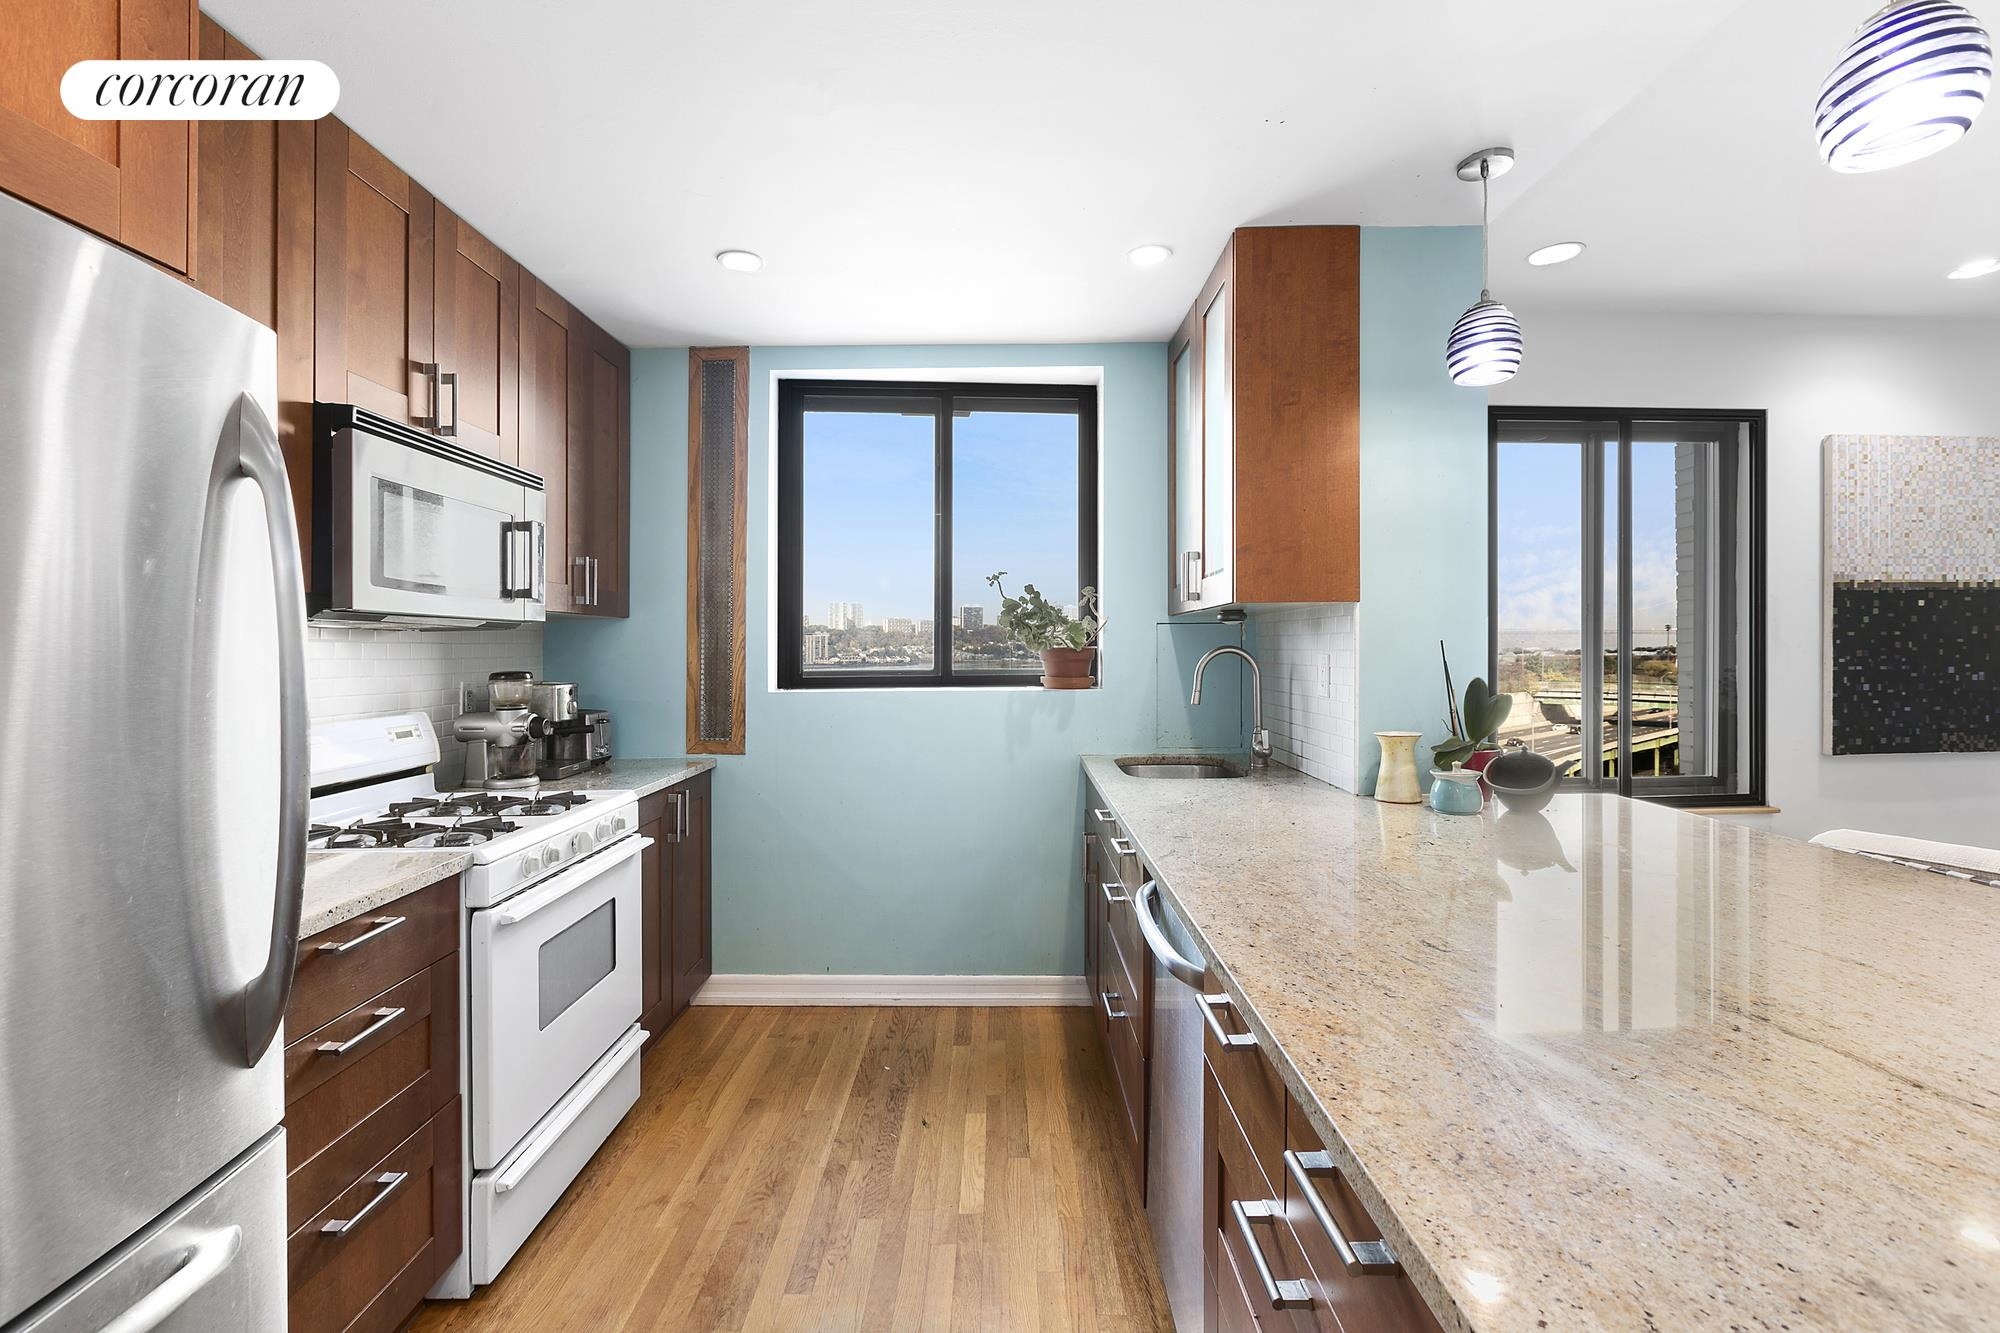 Corcoran, 575 Riverside Drive, Apt. 46, Hamilton Heights Real Estate ...